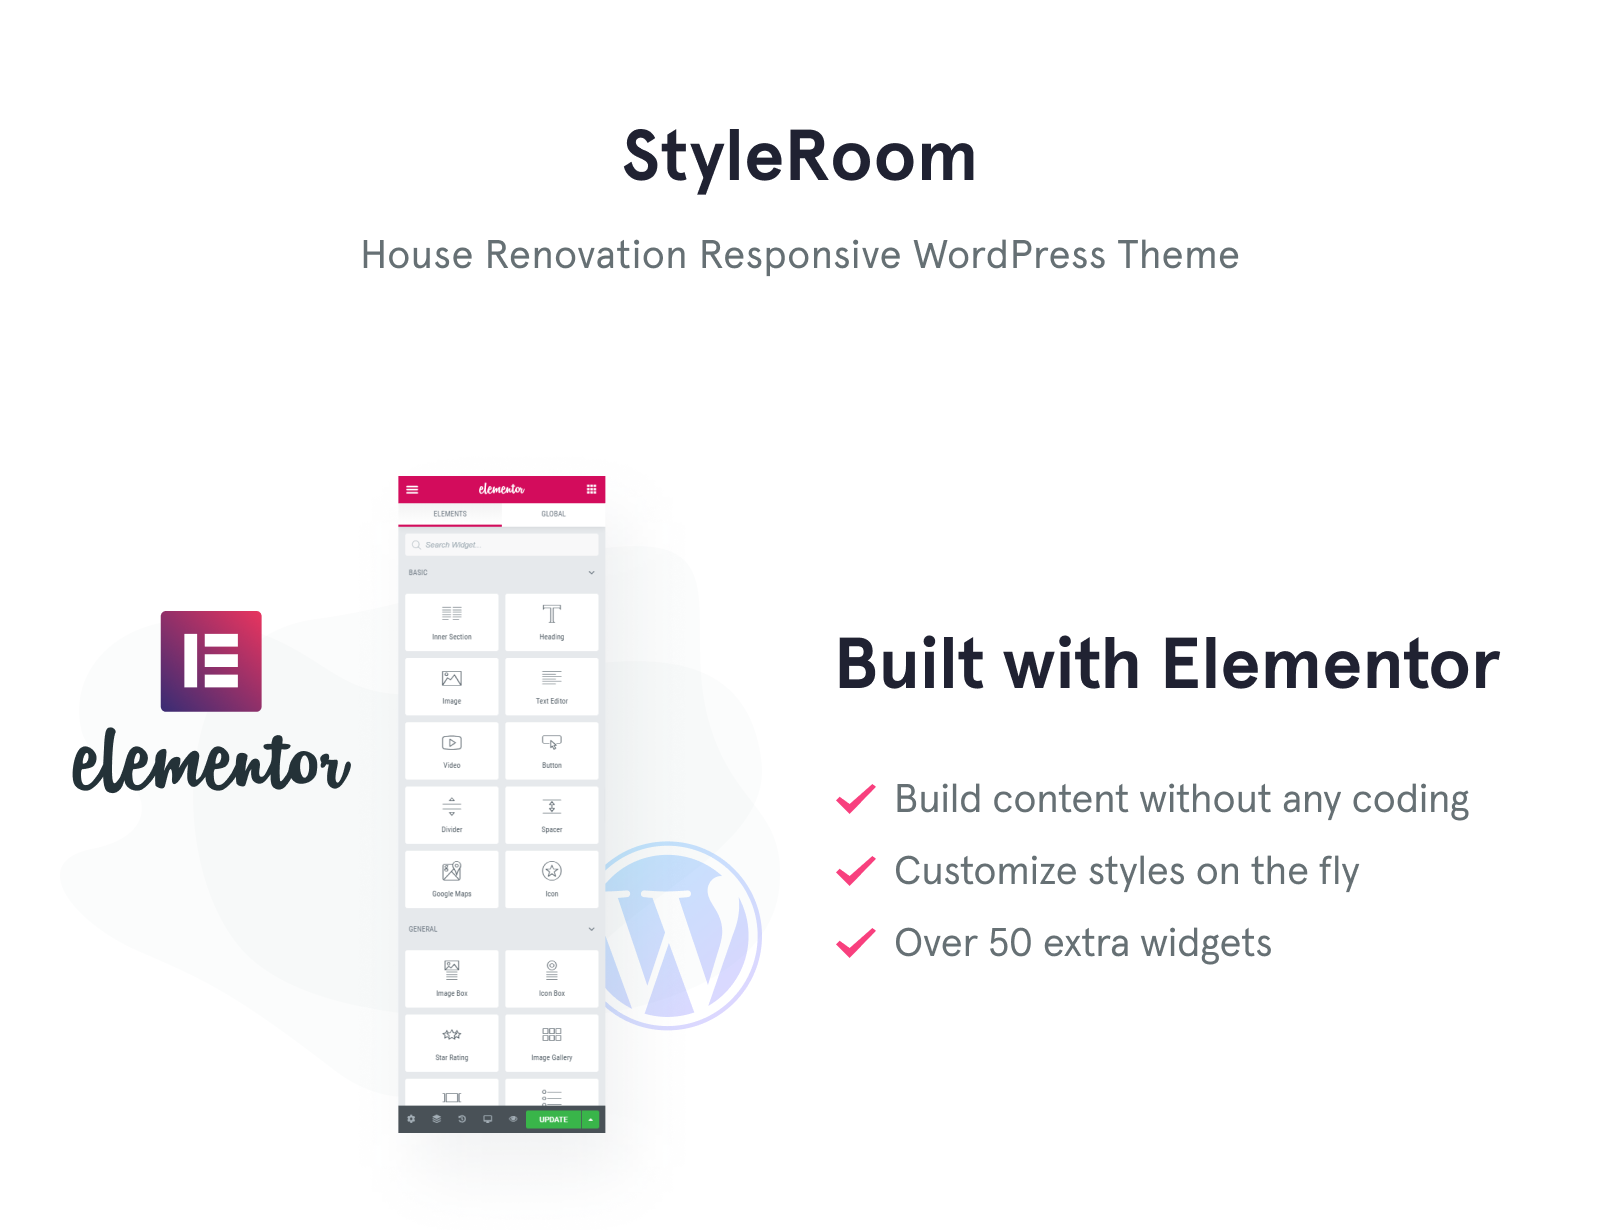 StyleRoom - House Renovation Responsive WordPress Theme WordPress Theme